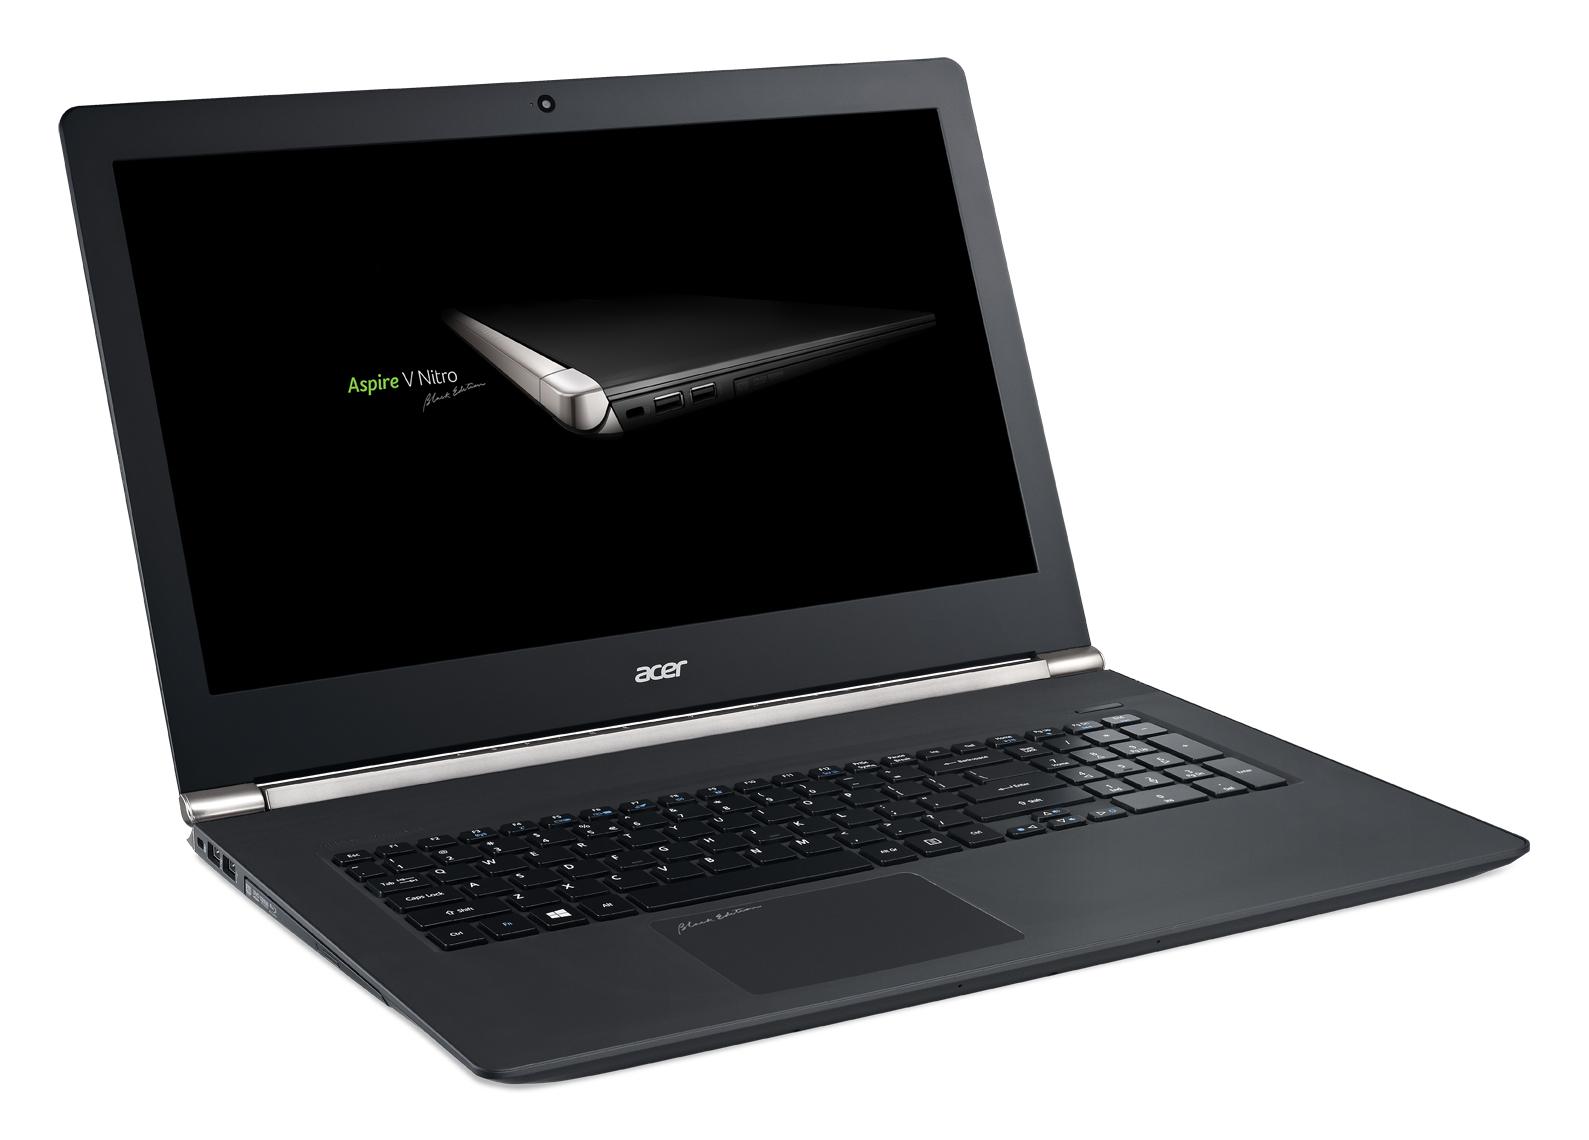 "Acer Aspire V 17 Nitro Black Edition (VN7-792G-722C) i7-6700HQ/8GB/128GB SSD+1TB/DVDRW/GTX 960M/17.3""FHD IPS mat/BT/W10 Home/Black"